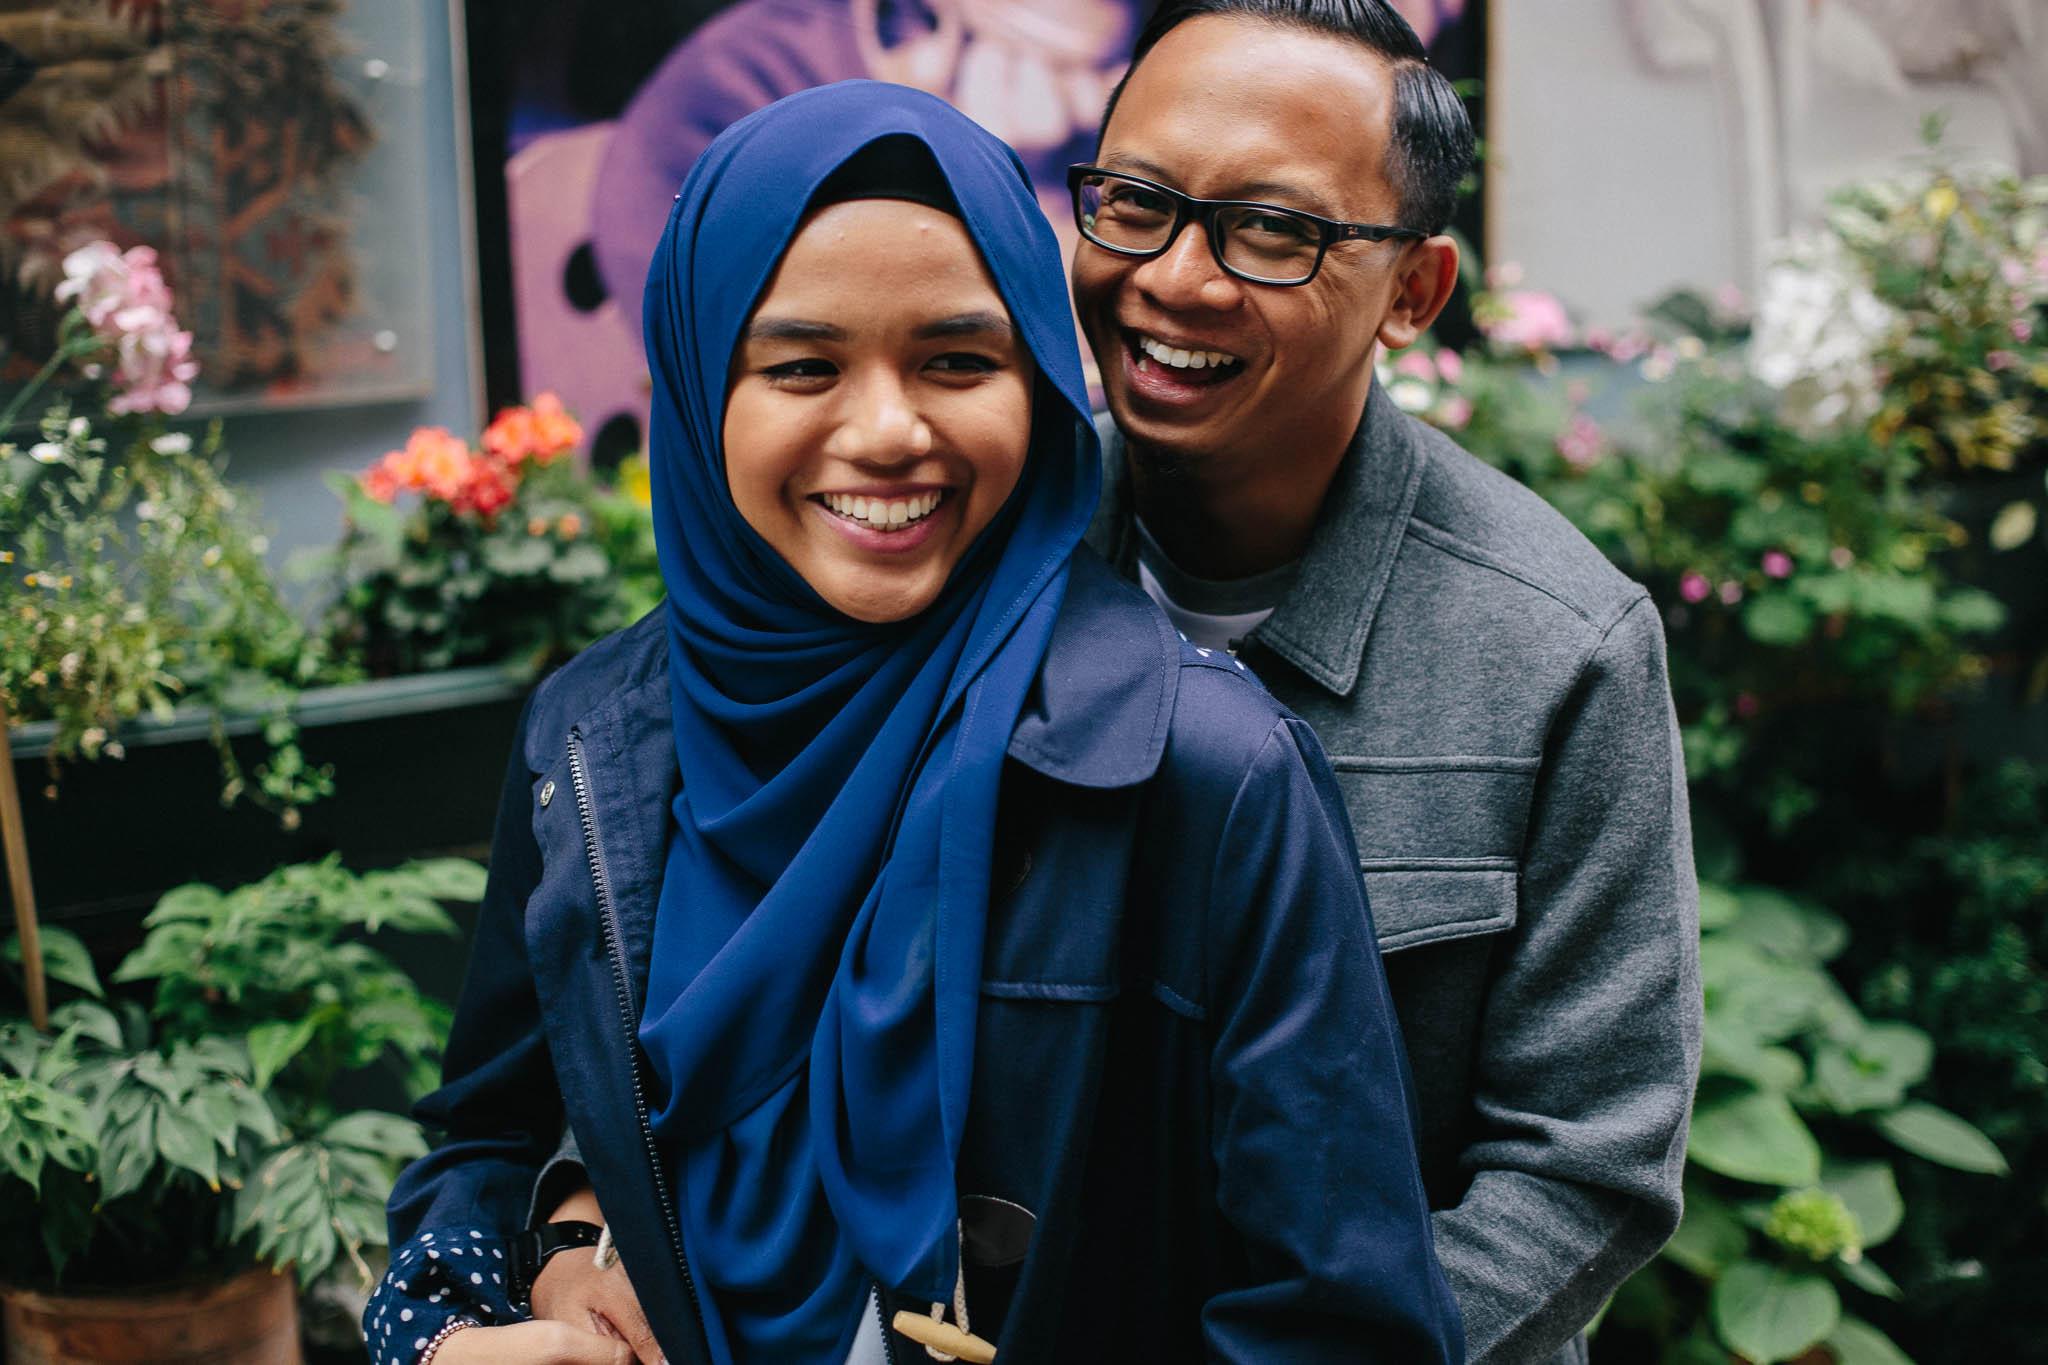 singapore-wedding-photographer-dzul-isma-istanbul-wmt-27.jpg